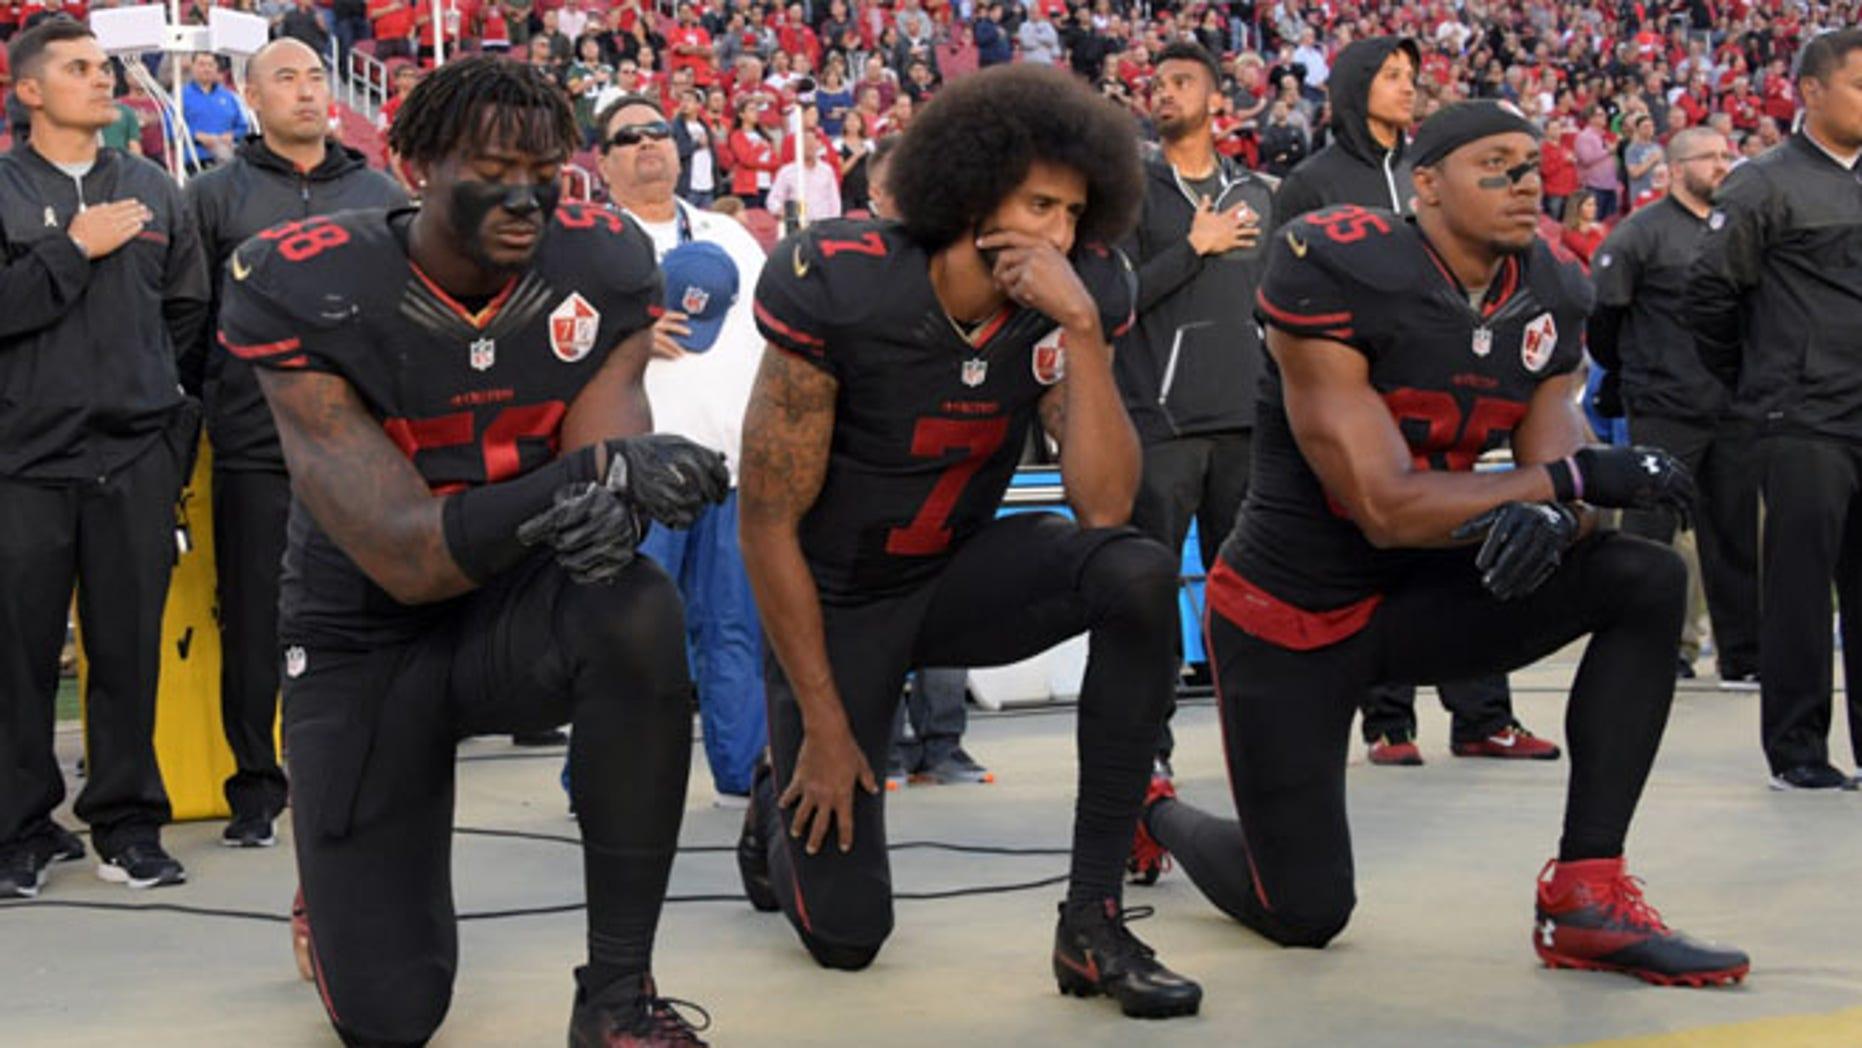 FILE 2016: San Francisco 49ers outside linebacker Eli Harold (58), quarterback Colin Kaepernick (7) and free safety Eric Reid (35) kneel in protest.